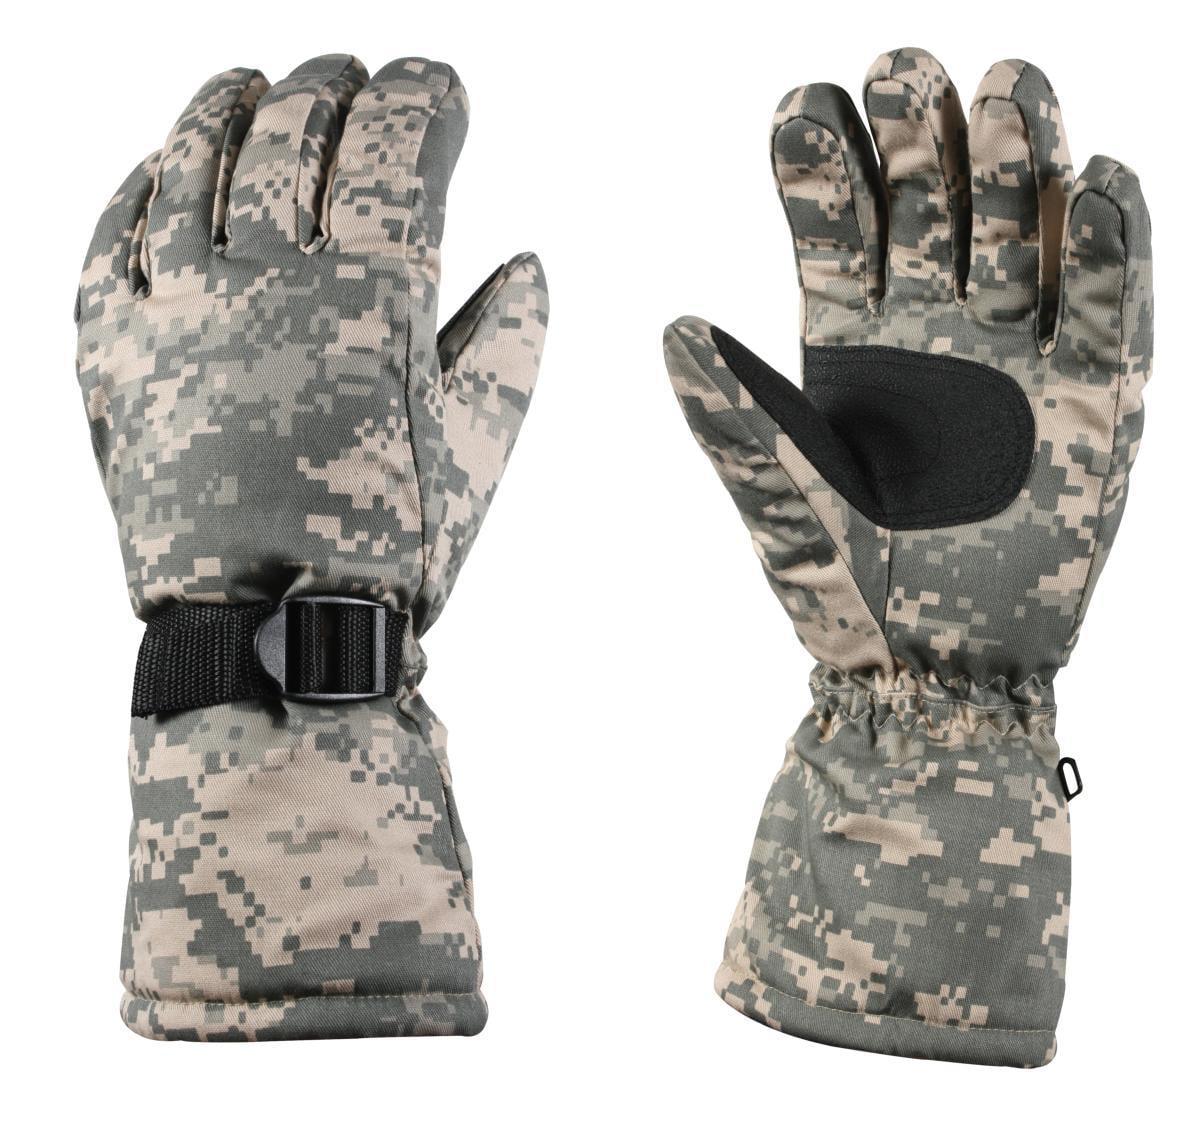 Rothco 4755 Xtra-Long Army Digital Camo Insulated Gloves, Medium by Rothco